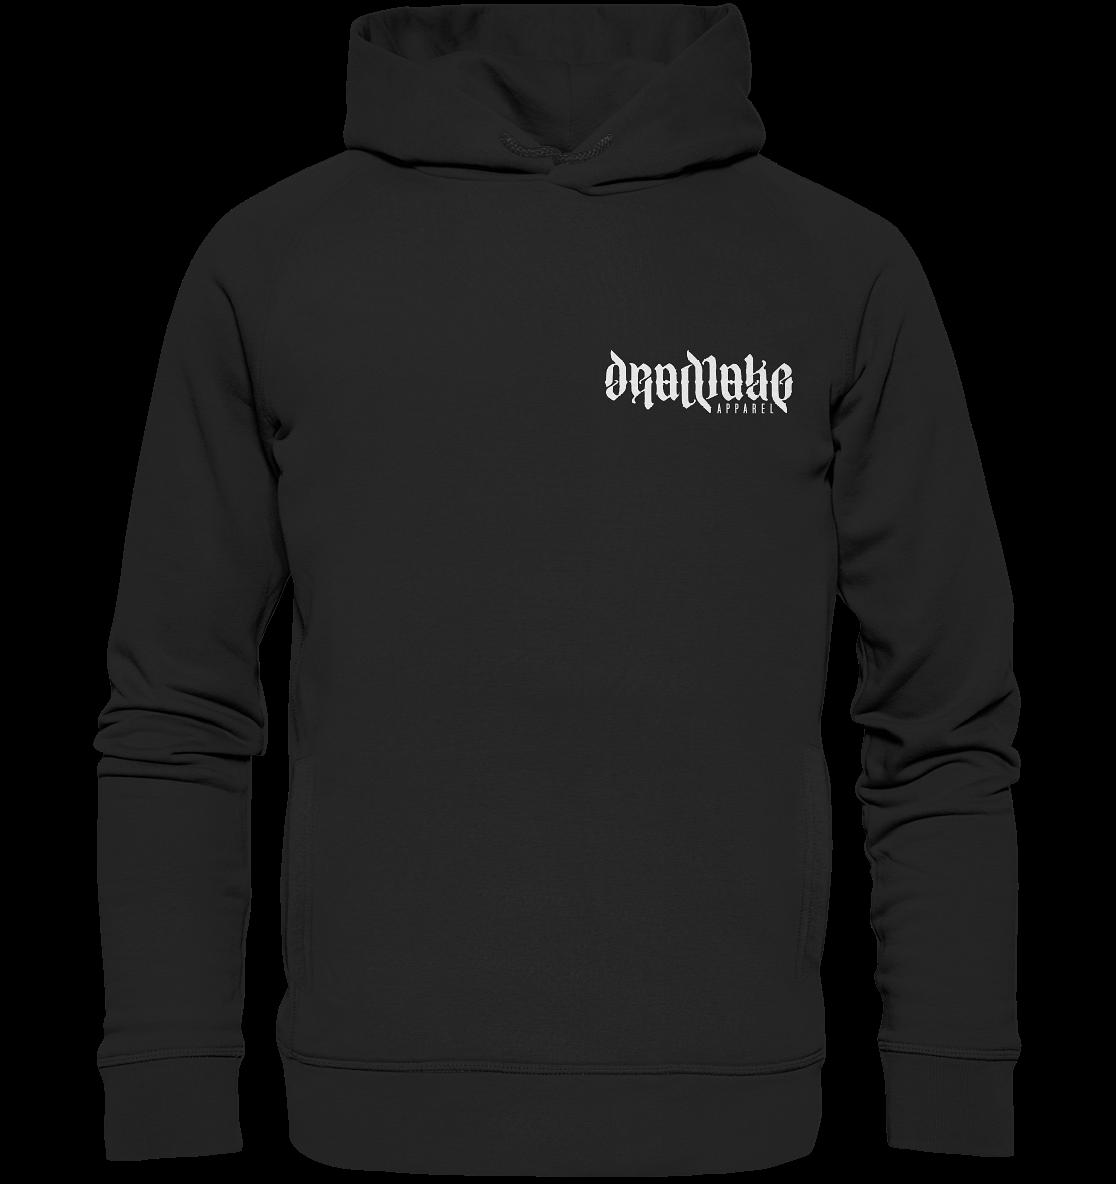 front-organic-fashion-hoodie-272727-1116x.png